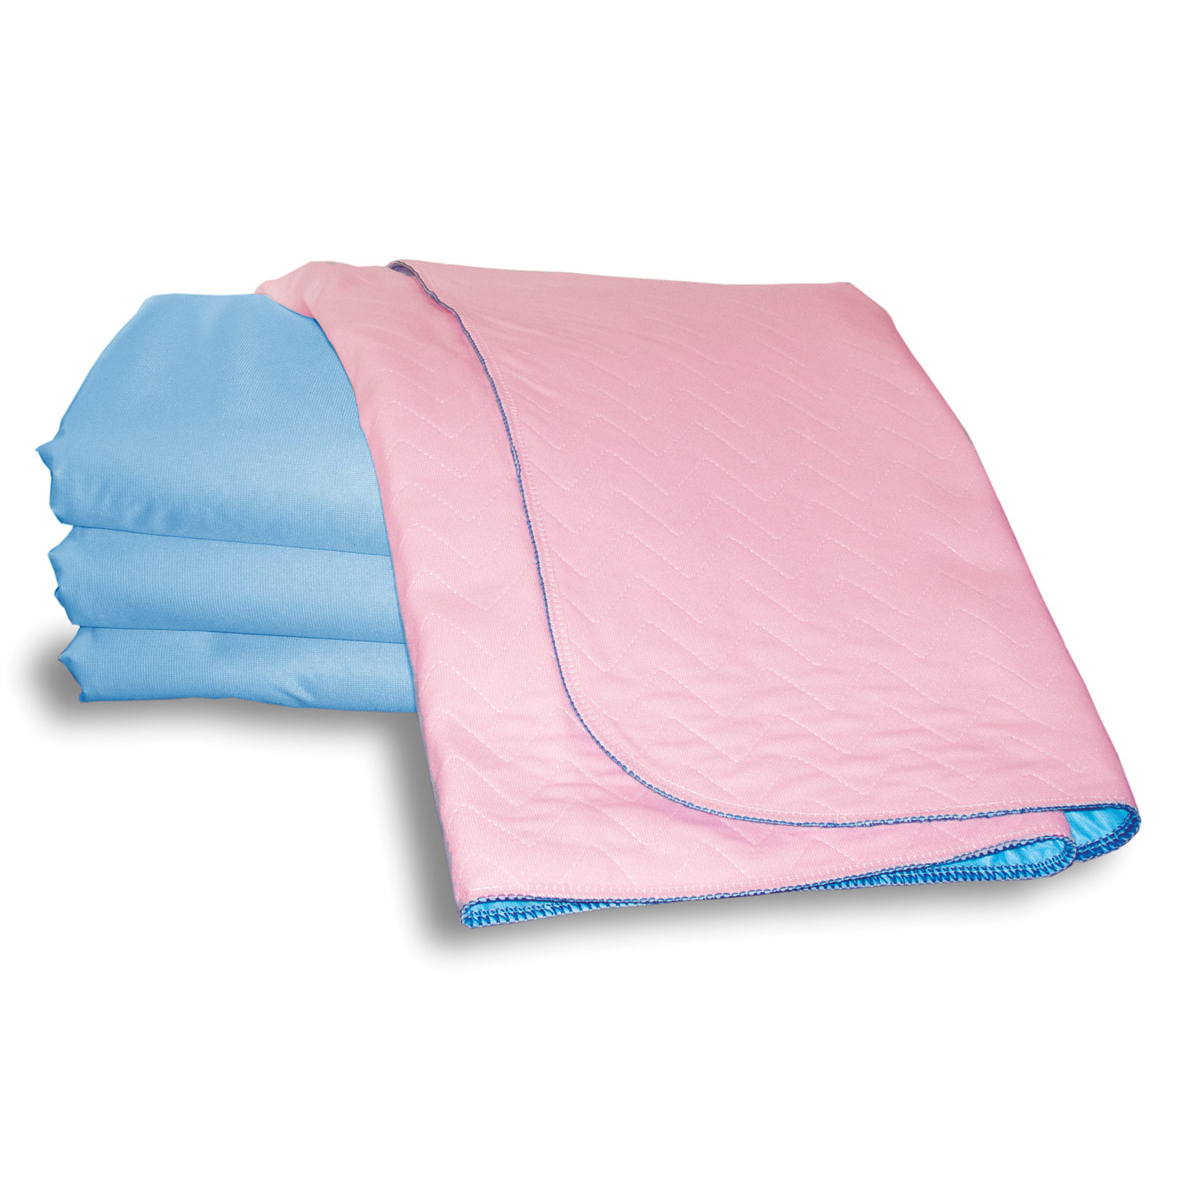 Sonoma Bedpads